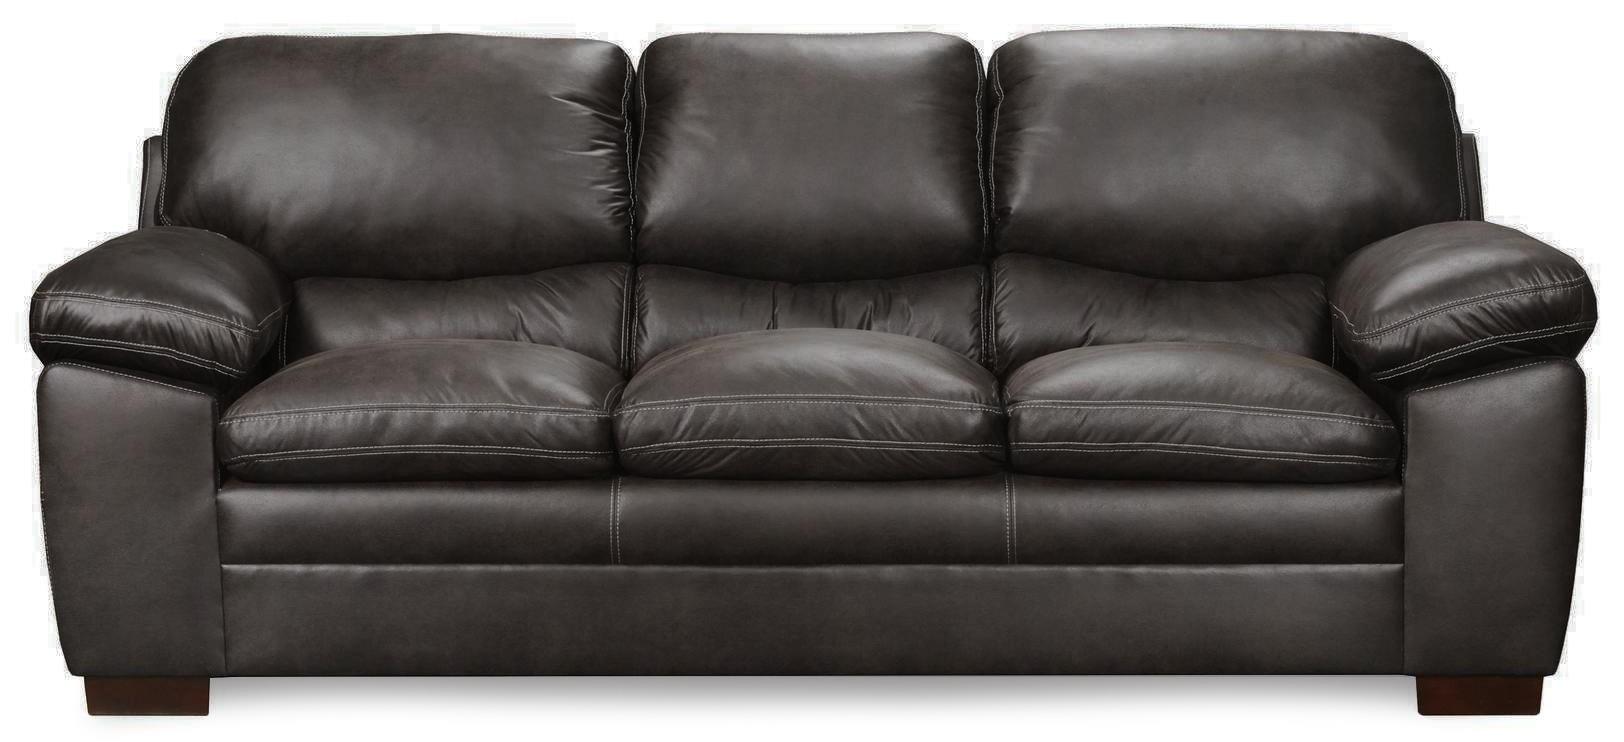 Ian - Ezra Pillow Arm Sofa at Rotmans